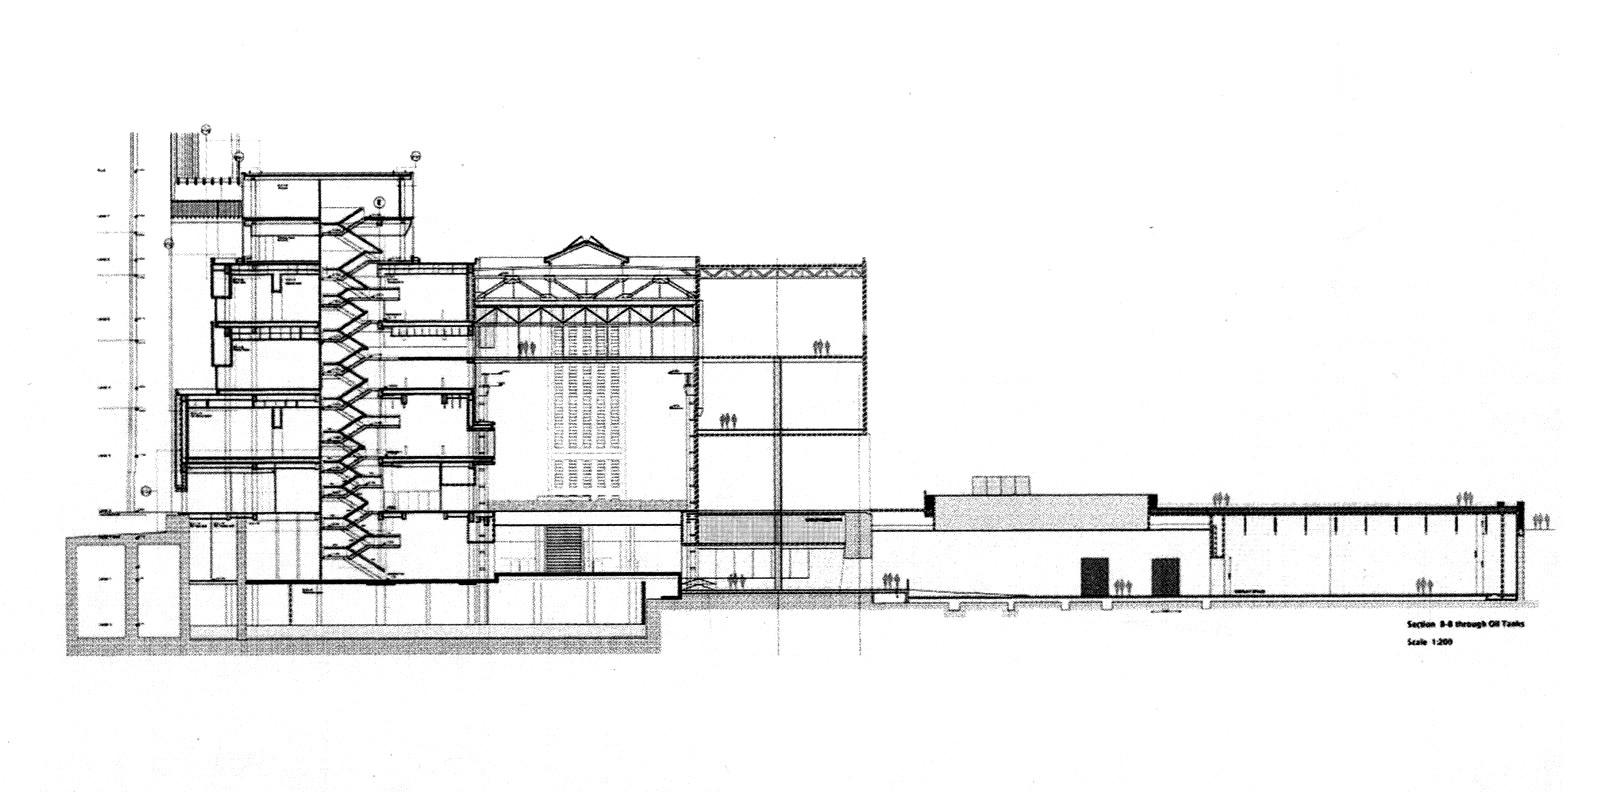 Ad classics the tate modern herzog de meuron archdaily for Tate modern building design